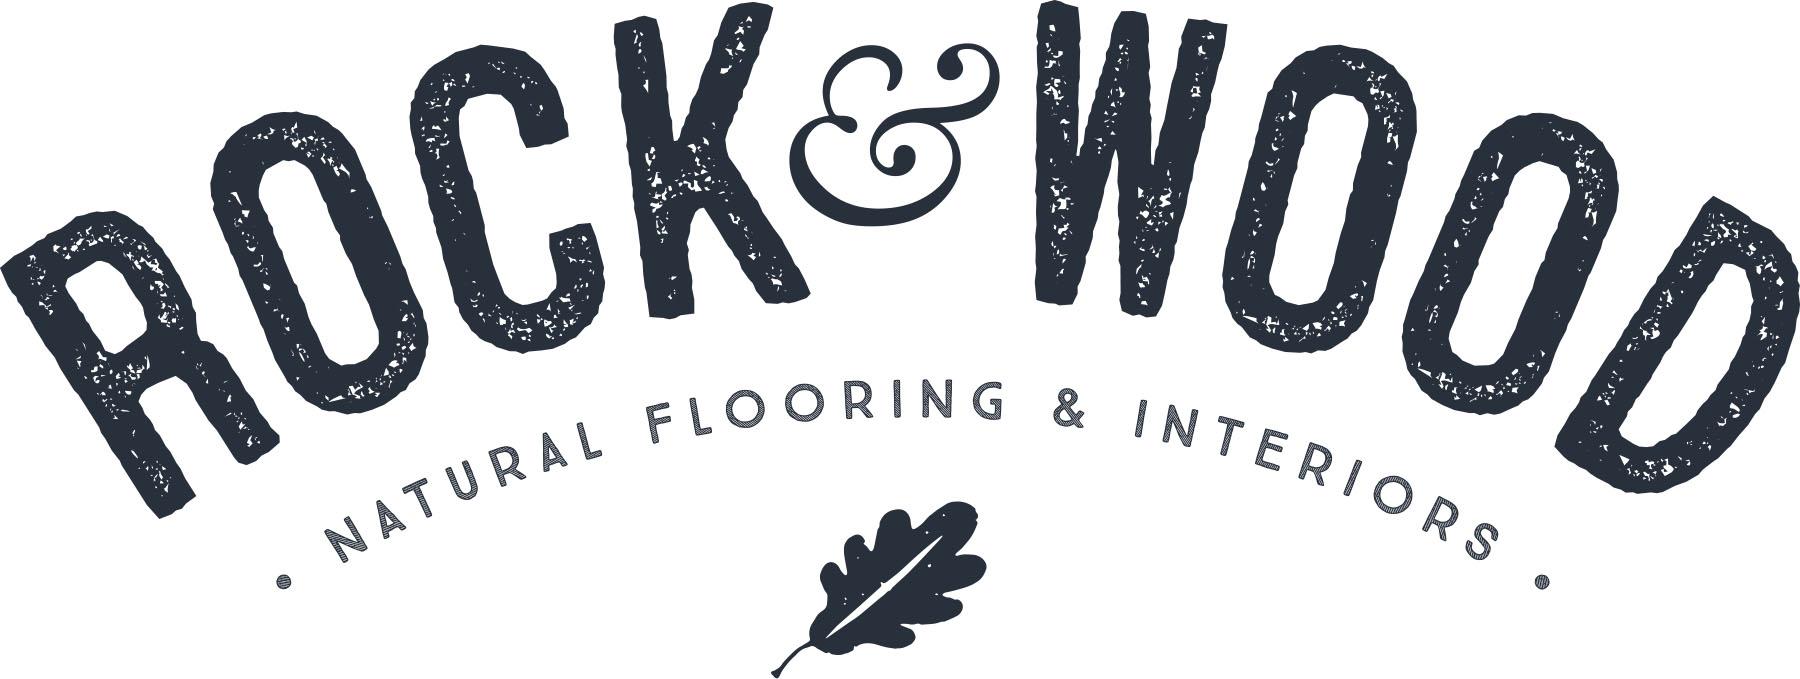 Rock & Wood Curve Logo.jpg